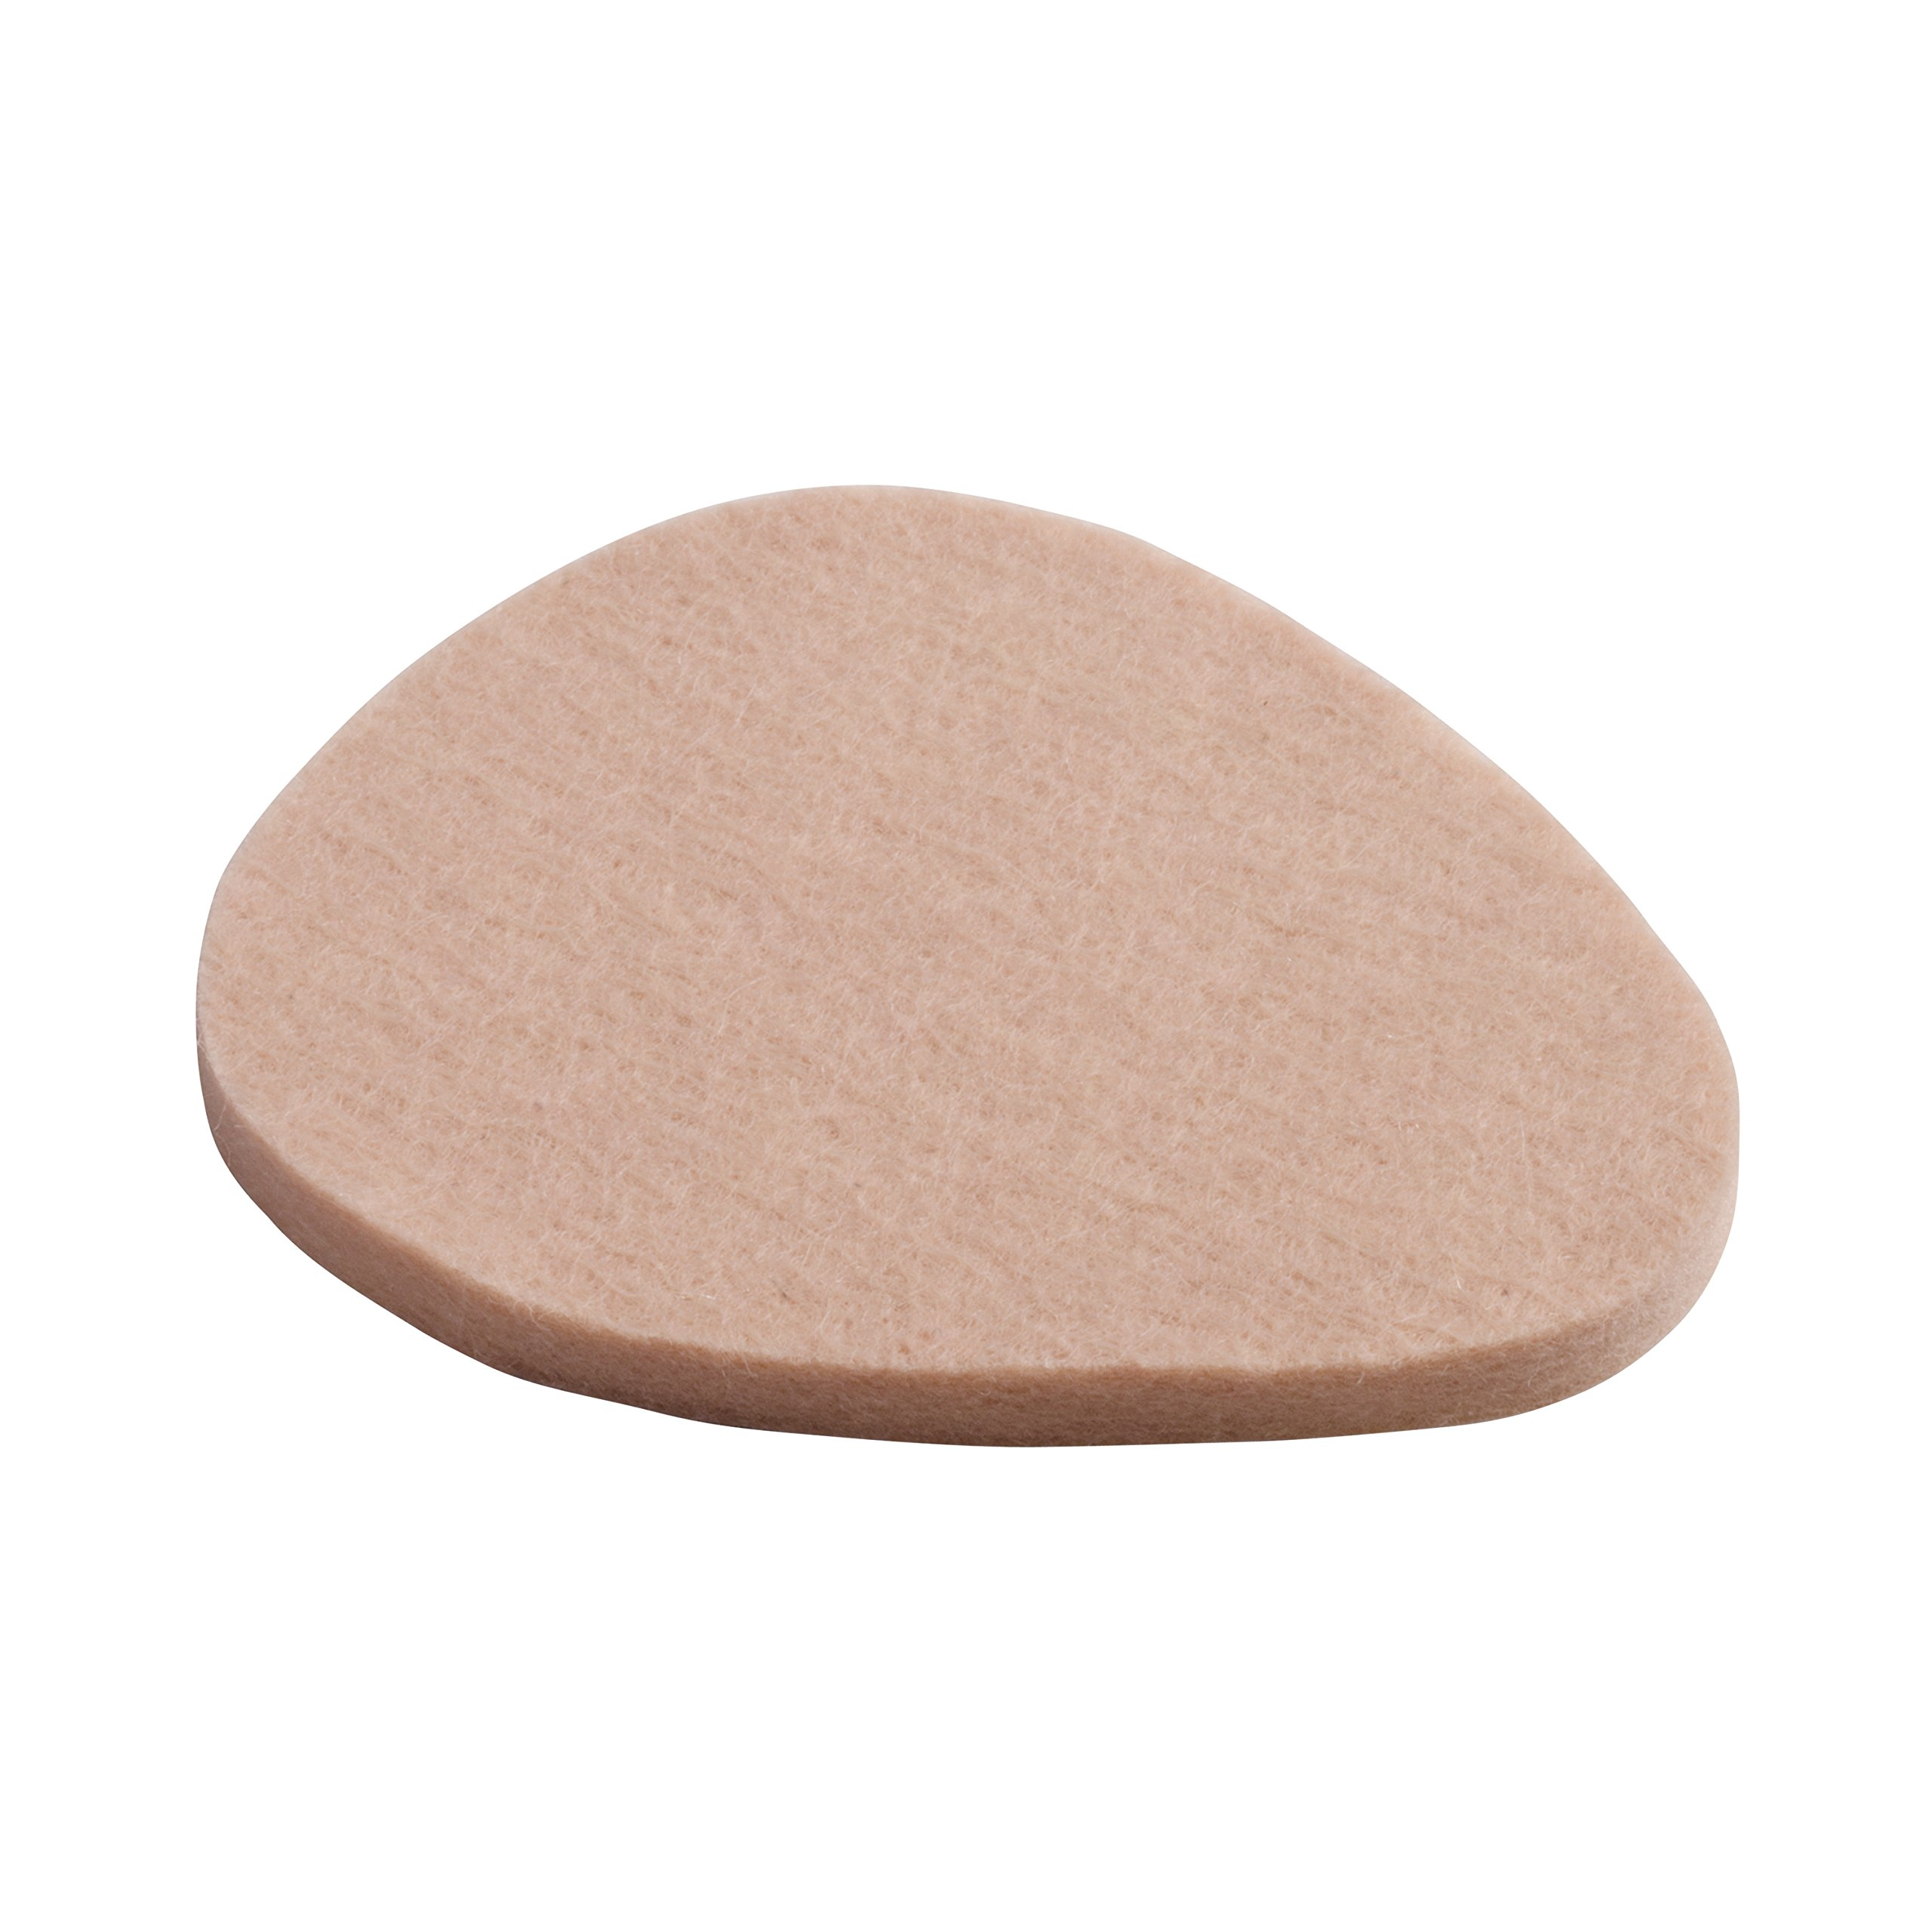 Steins 3/16 Inch Adhesive Felt No.20-N Meta Pads, 100 Count